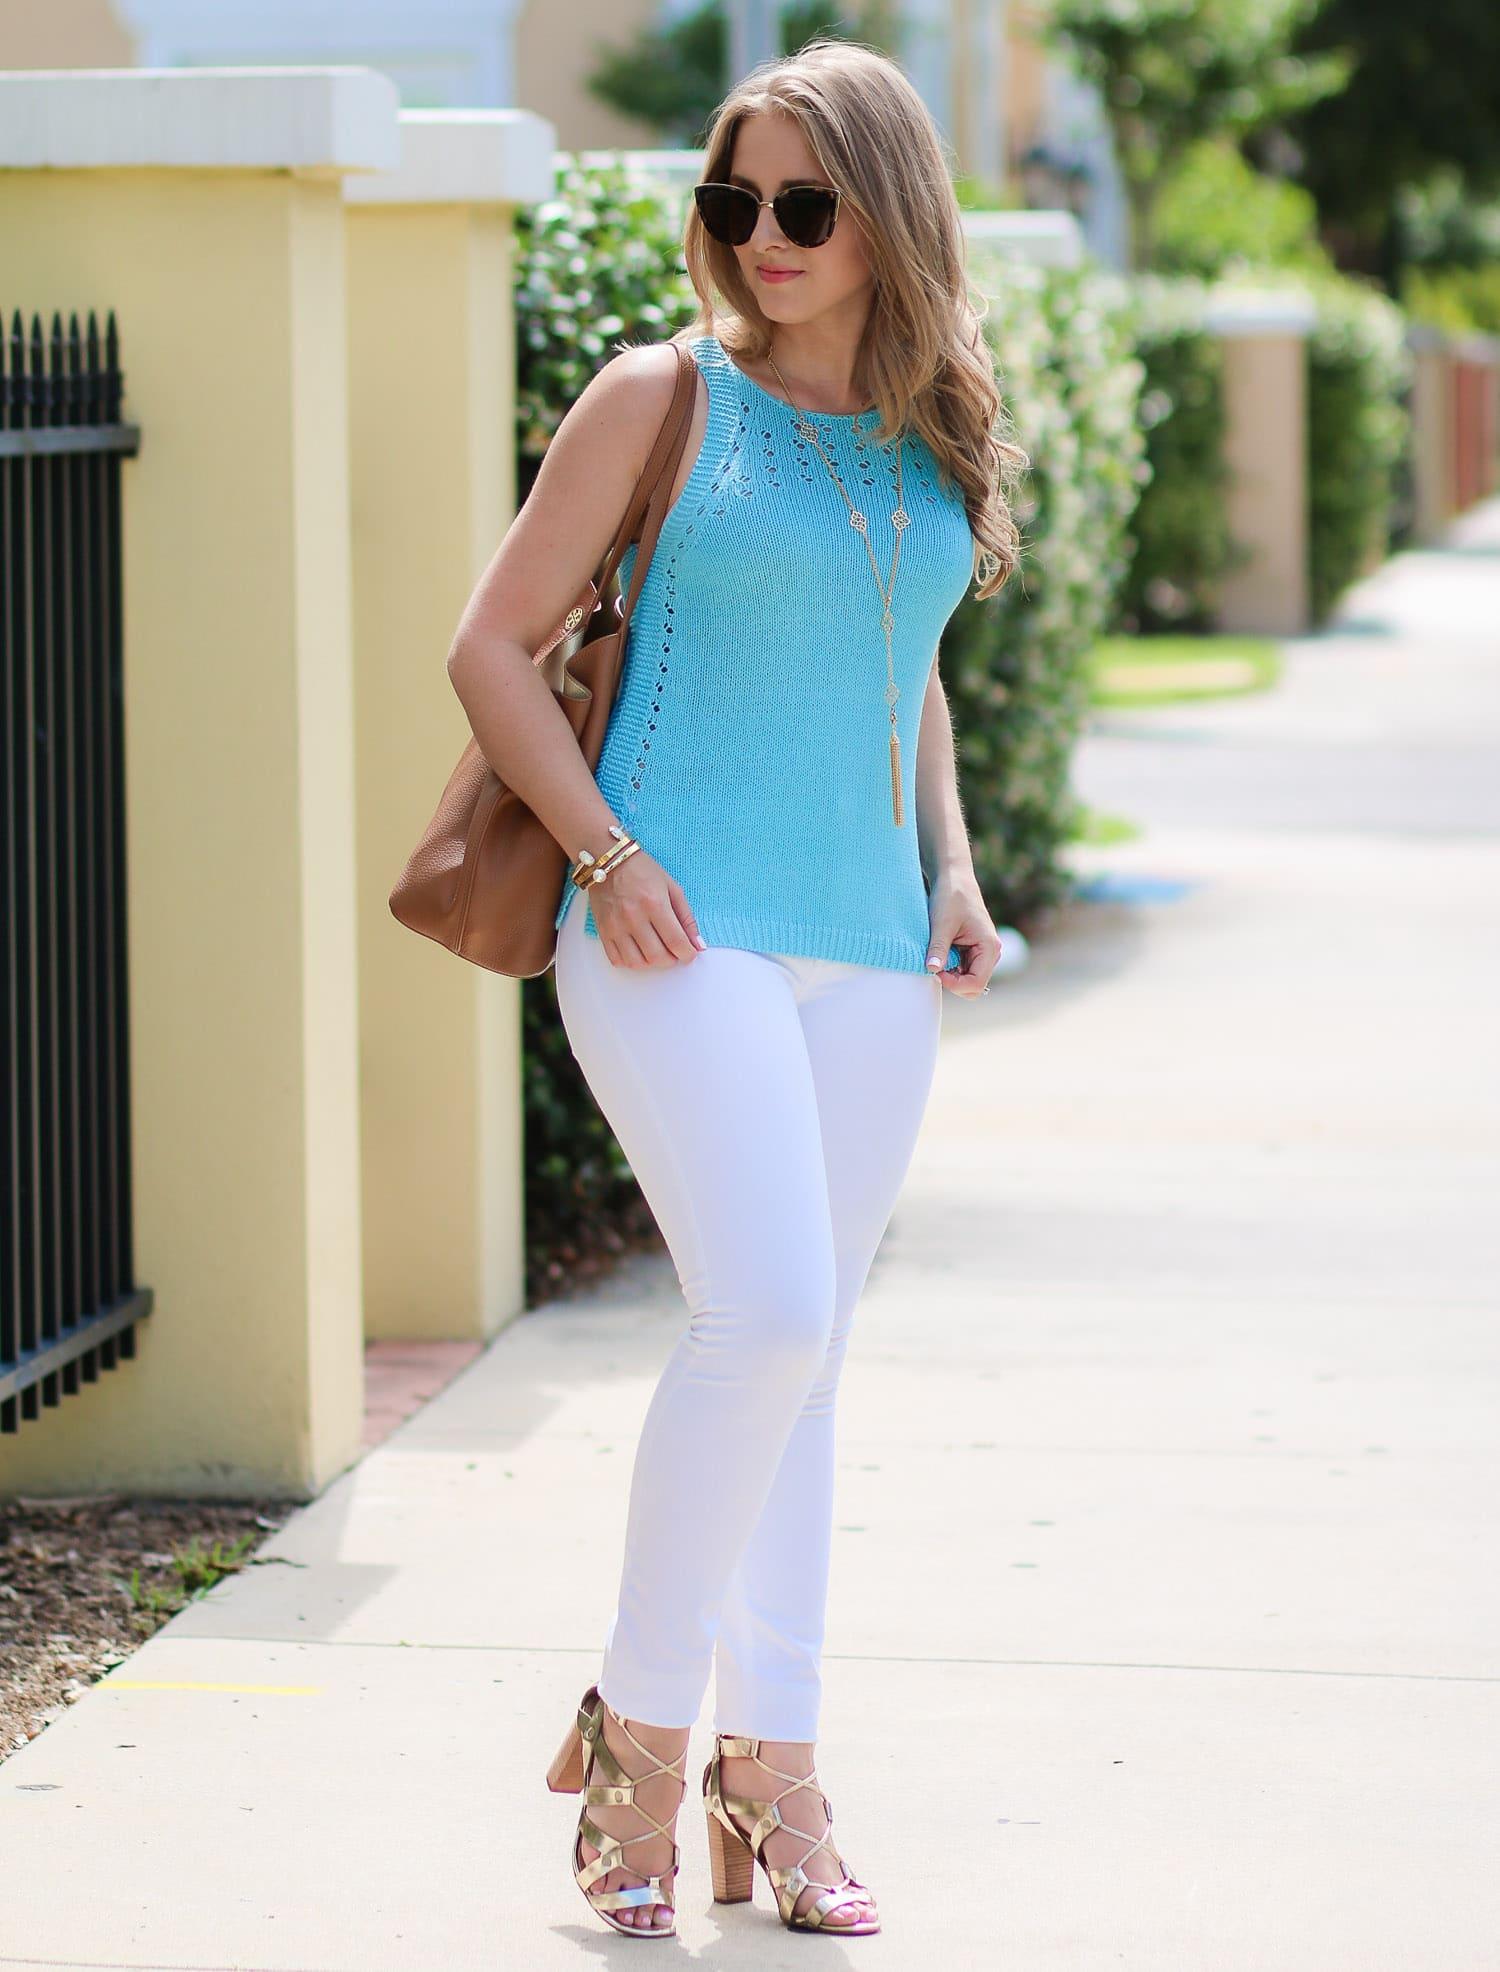 Lilly-Pulitzer-Mac-Sweater-Tank-Breakwater-Blue-Banana-republic-gold-lace-up-heels-fashion-blogger-ashley-brooke-nicholas-2991